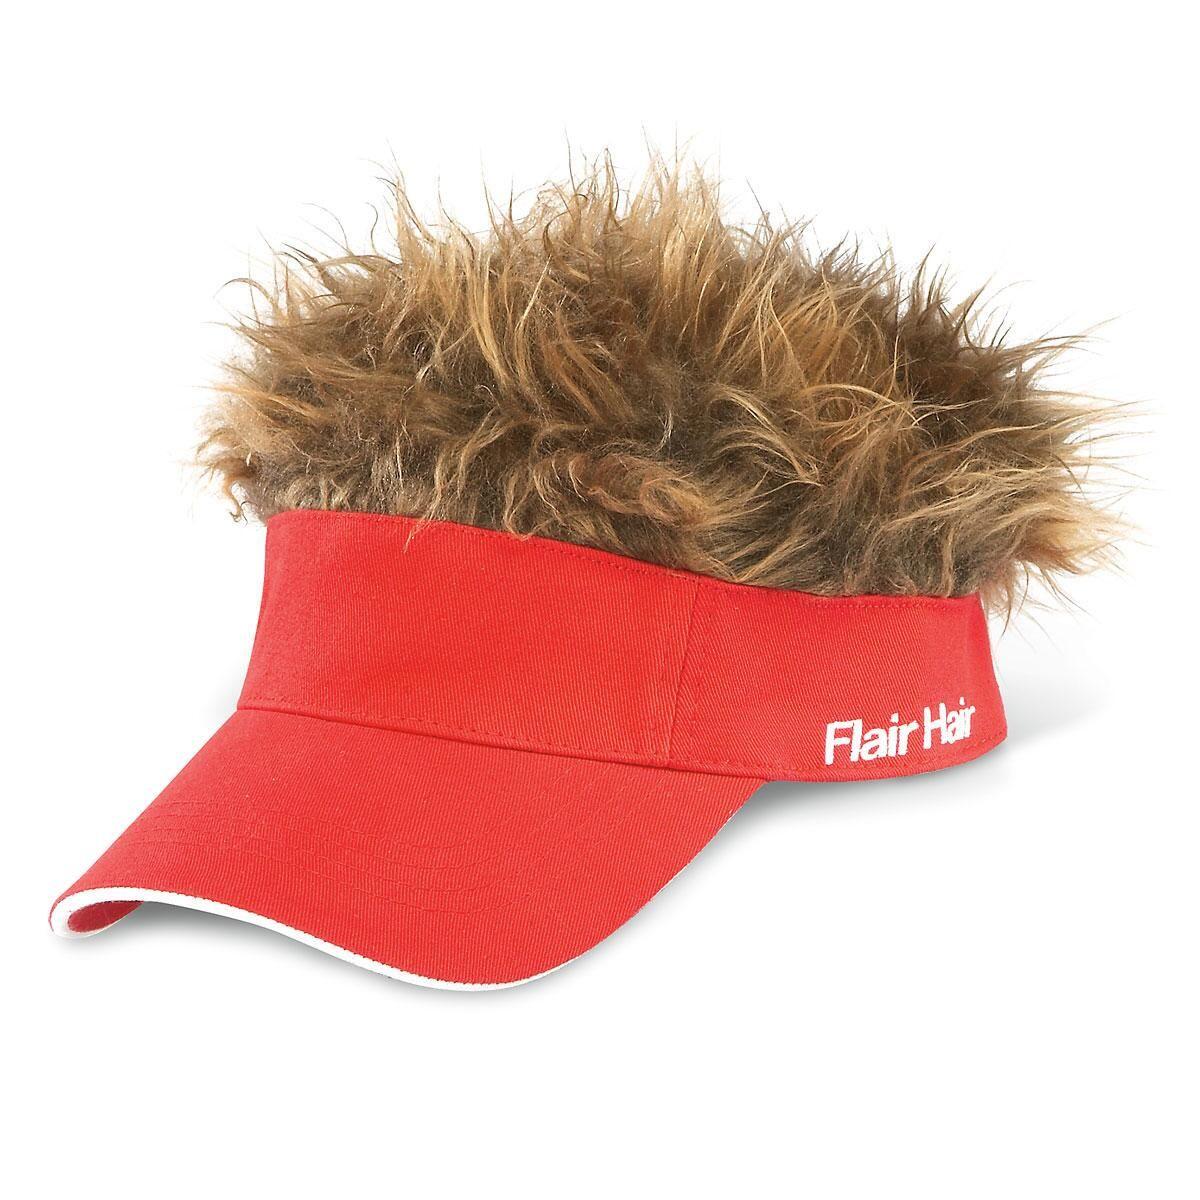 Red Flair Hair Visor